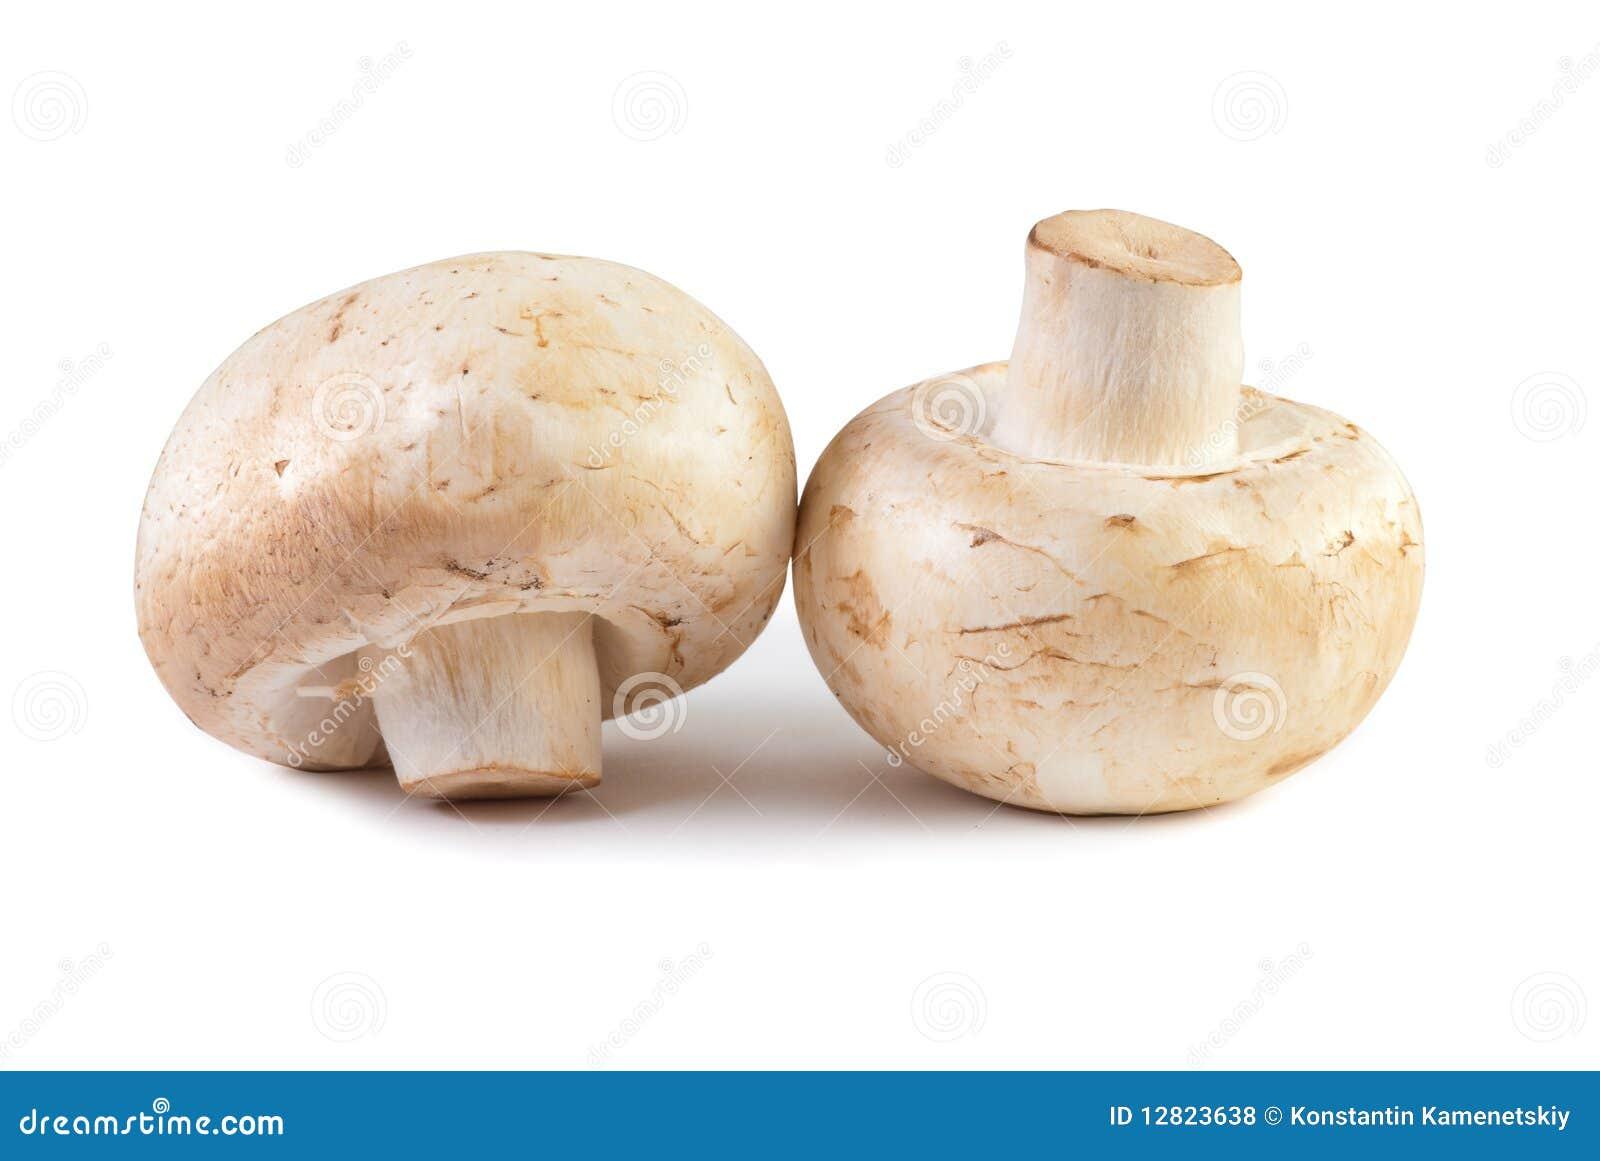 Champignon Mushroom Macro Isolated Stock Photo - Image of vegetable, macro: 12823638